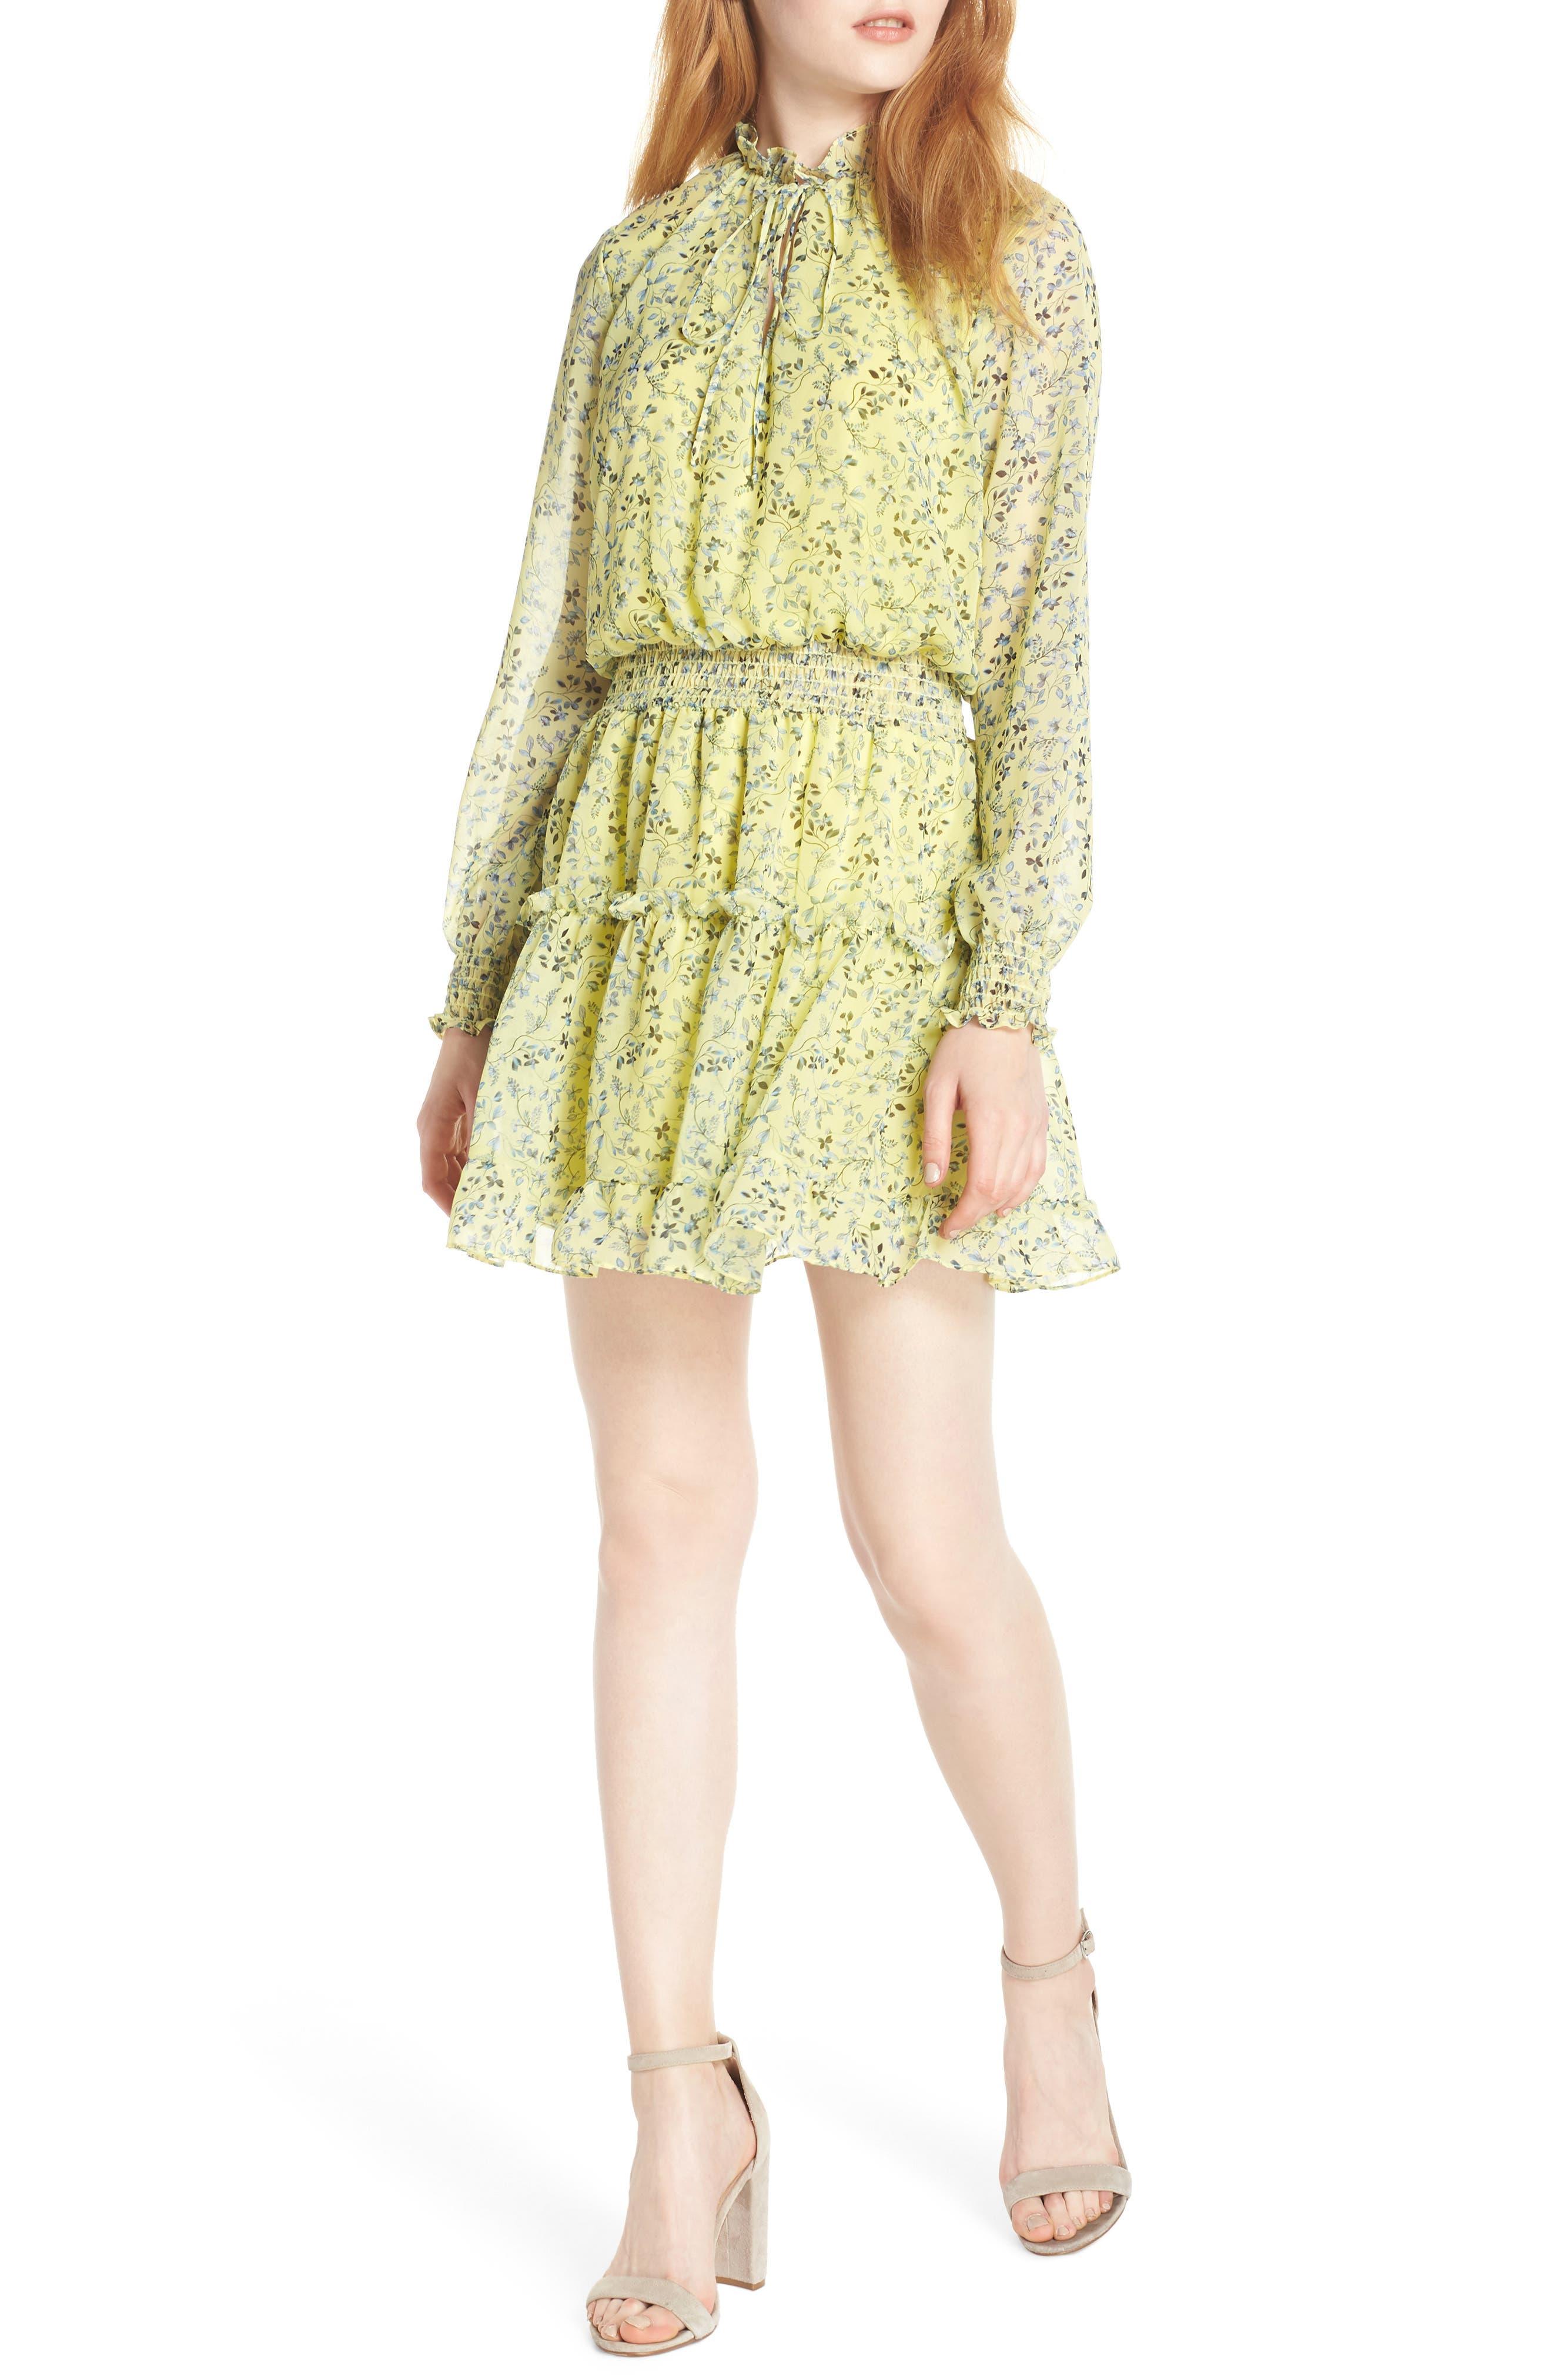 Nsr Emma Floral Print Ruffle Dress, Yellow